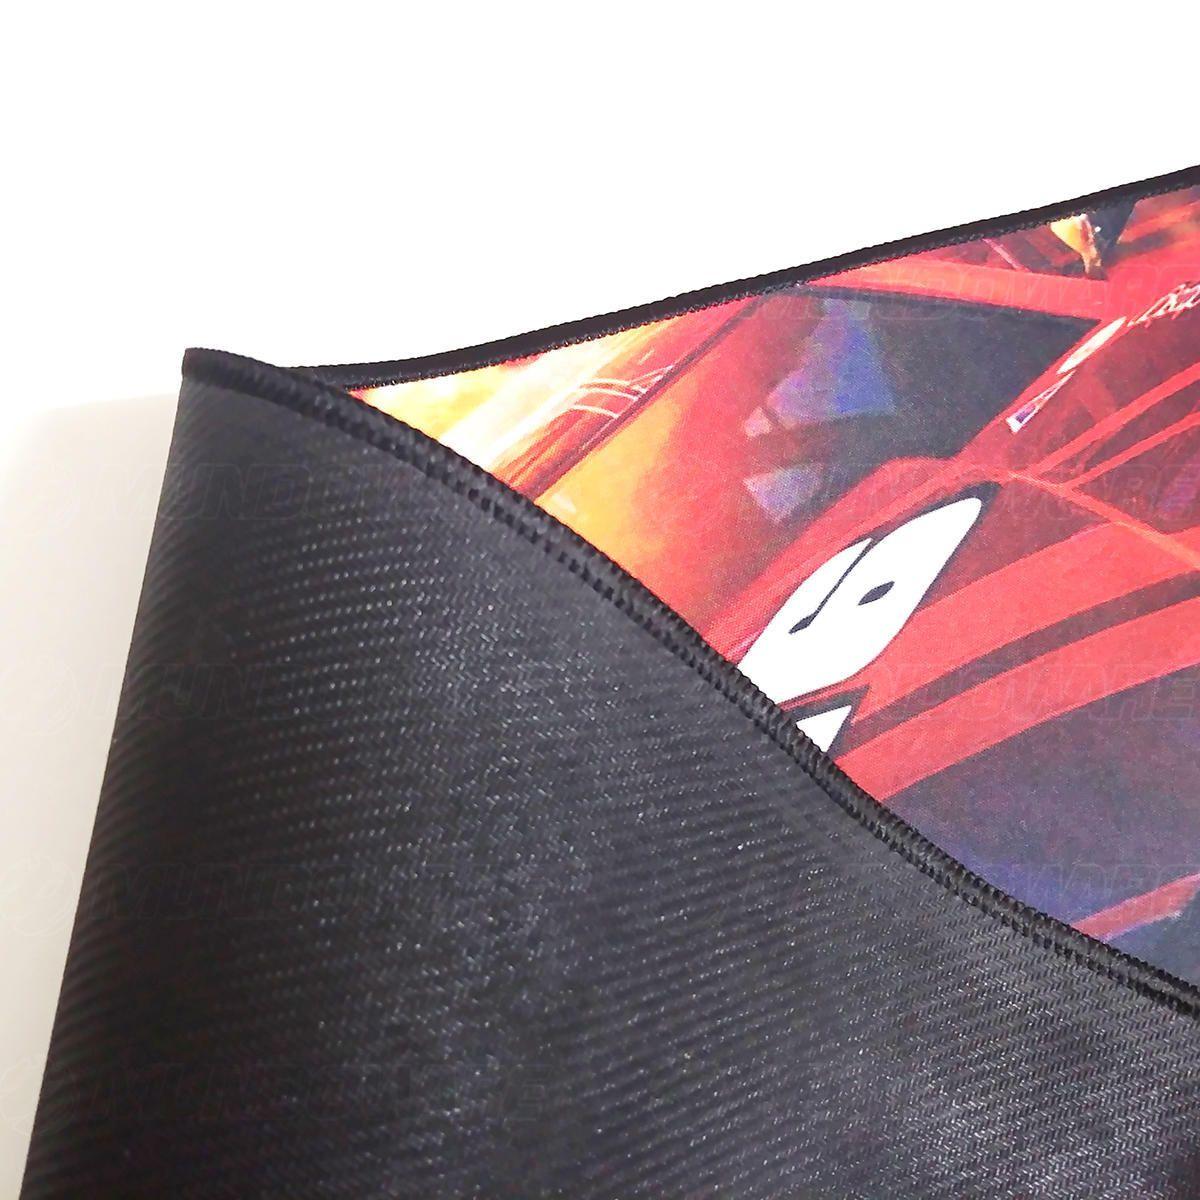 Mouse Pad Gamer Extra Grande 700x350x3mm Bordas Costuradas e Base Antiderrapante Modelo Carro de Corrida Exbom MP7035C